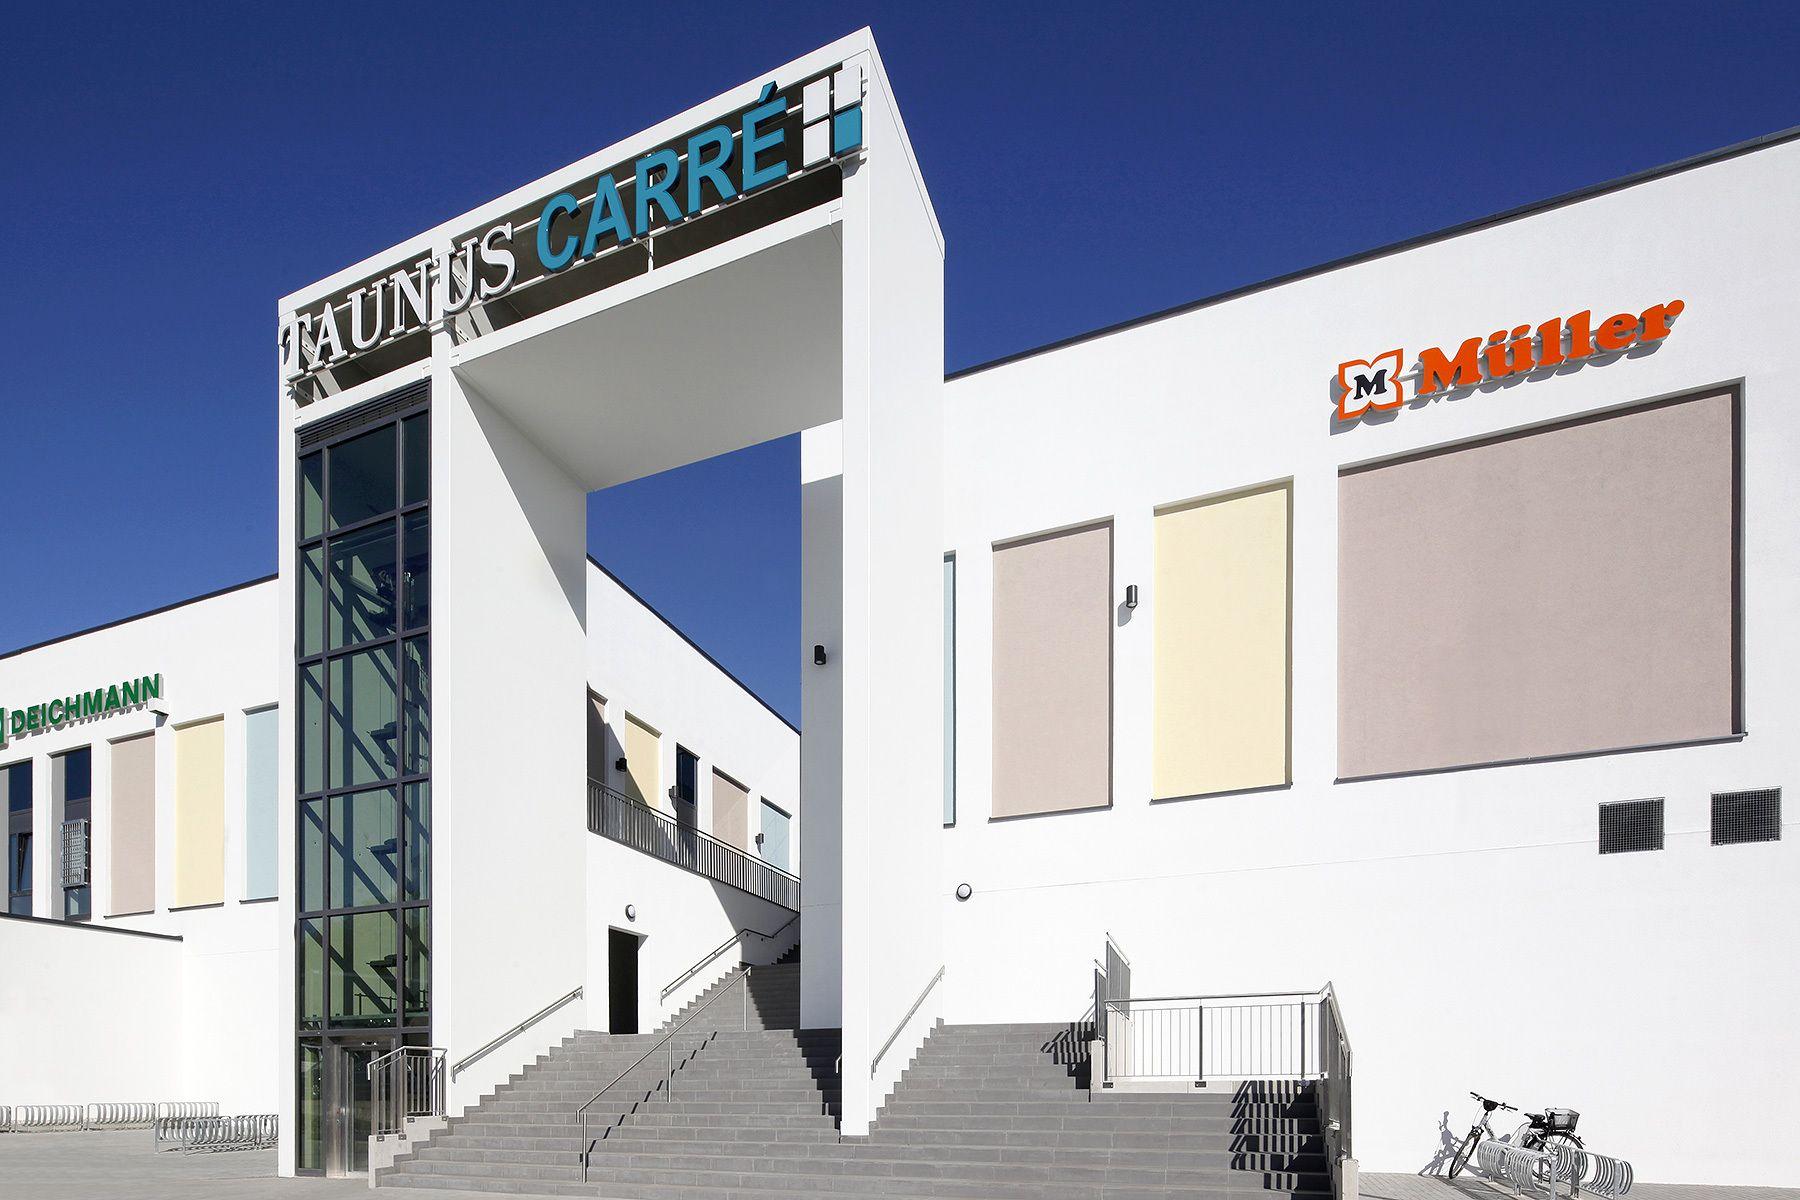 Taunus Carré, Friedrichsdorf 2013